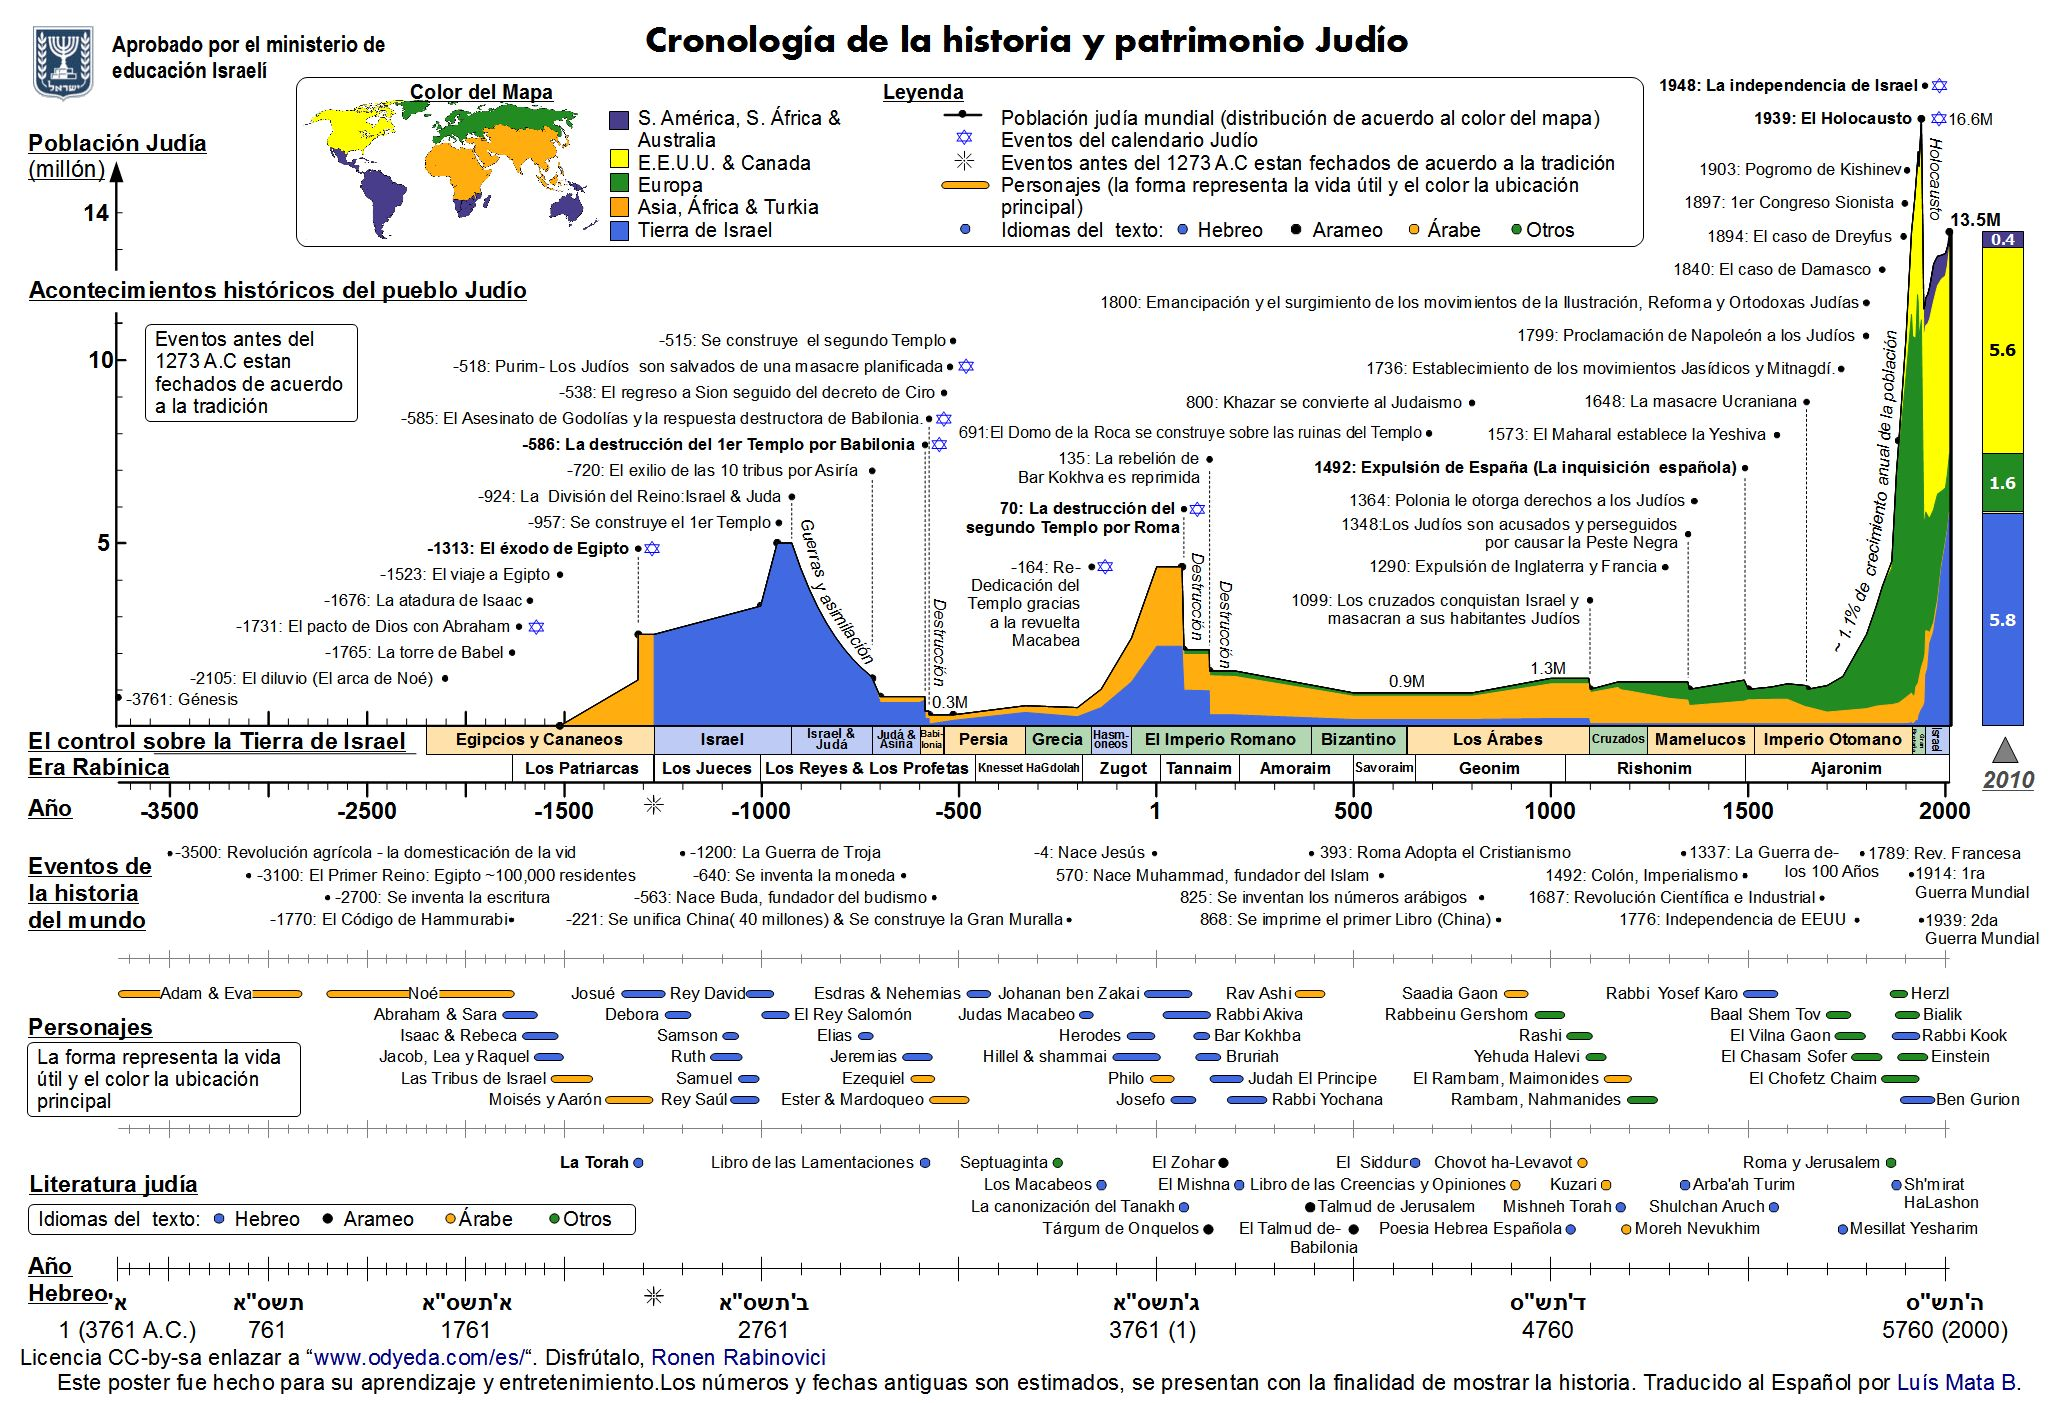 Cronologia De La Judio